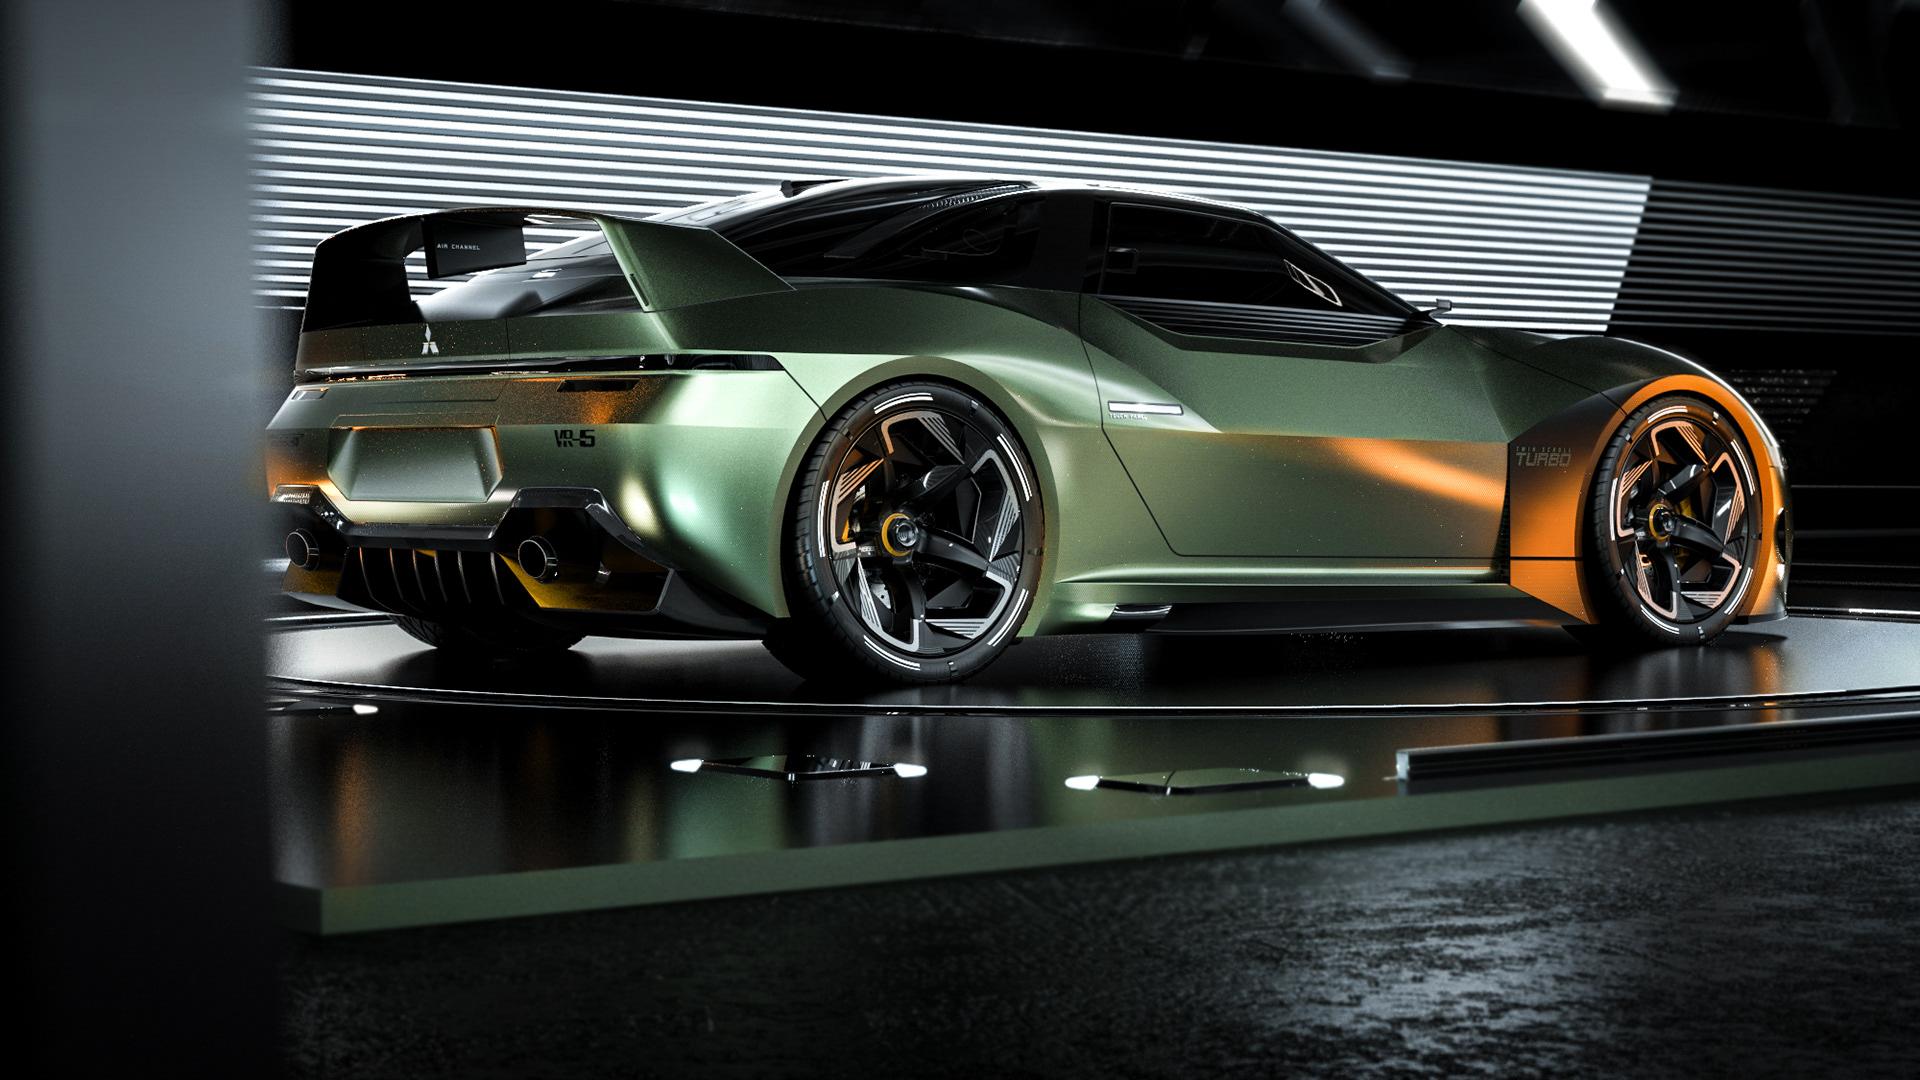 Mitsubishi 4000 GT Rendering | Source: Matthew Parsons